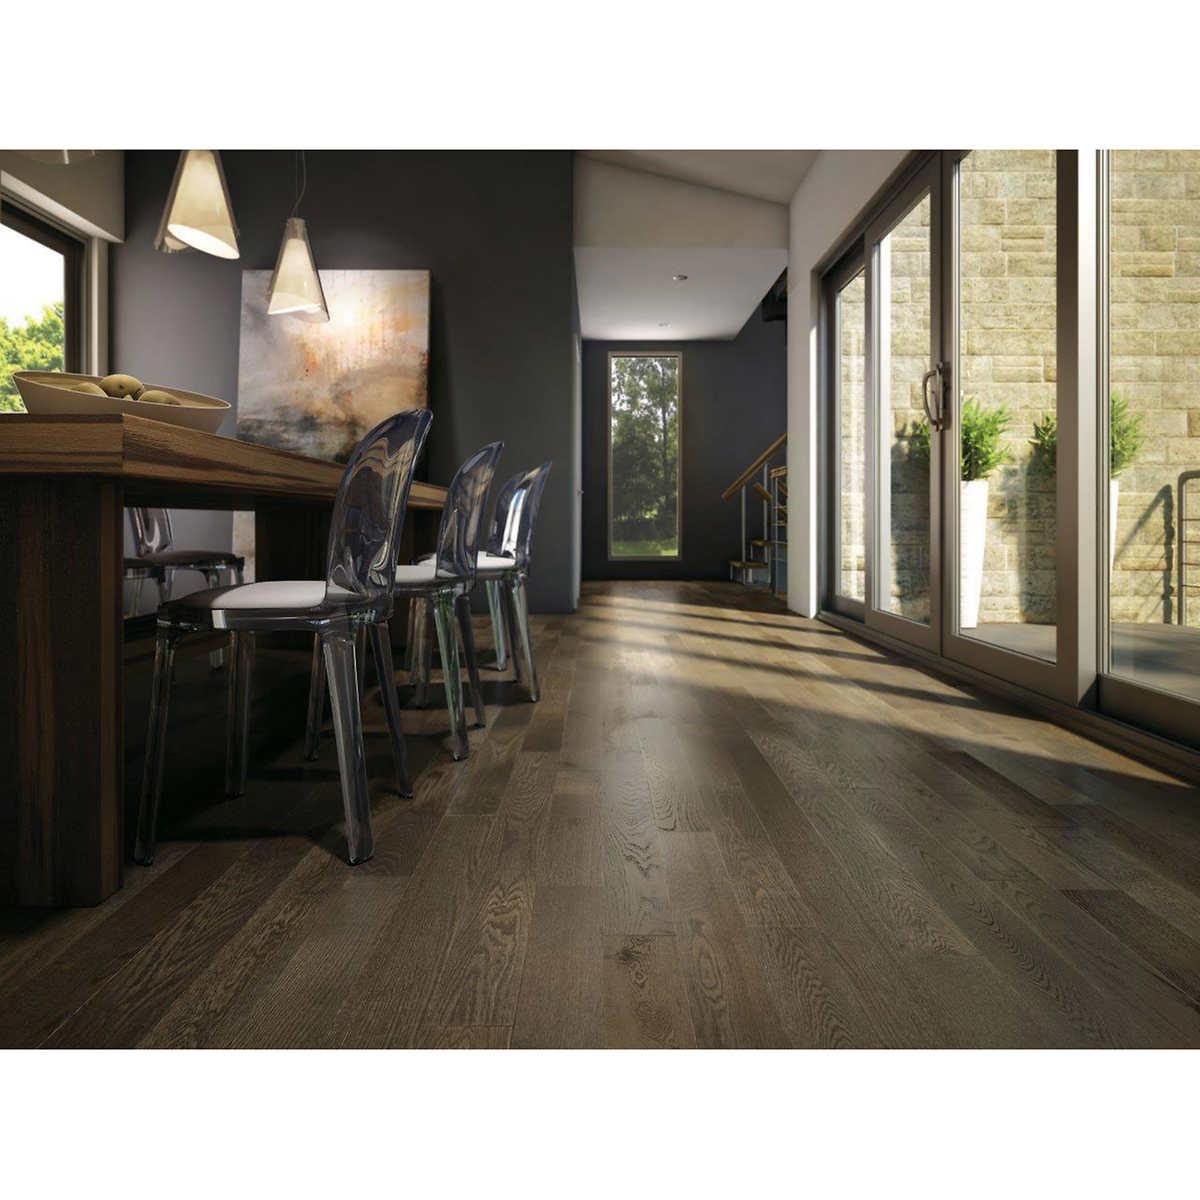 Engineered Wood Flooring with Underlayment Included - Engineered Flooring Costco